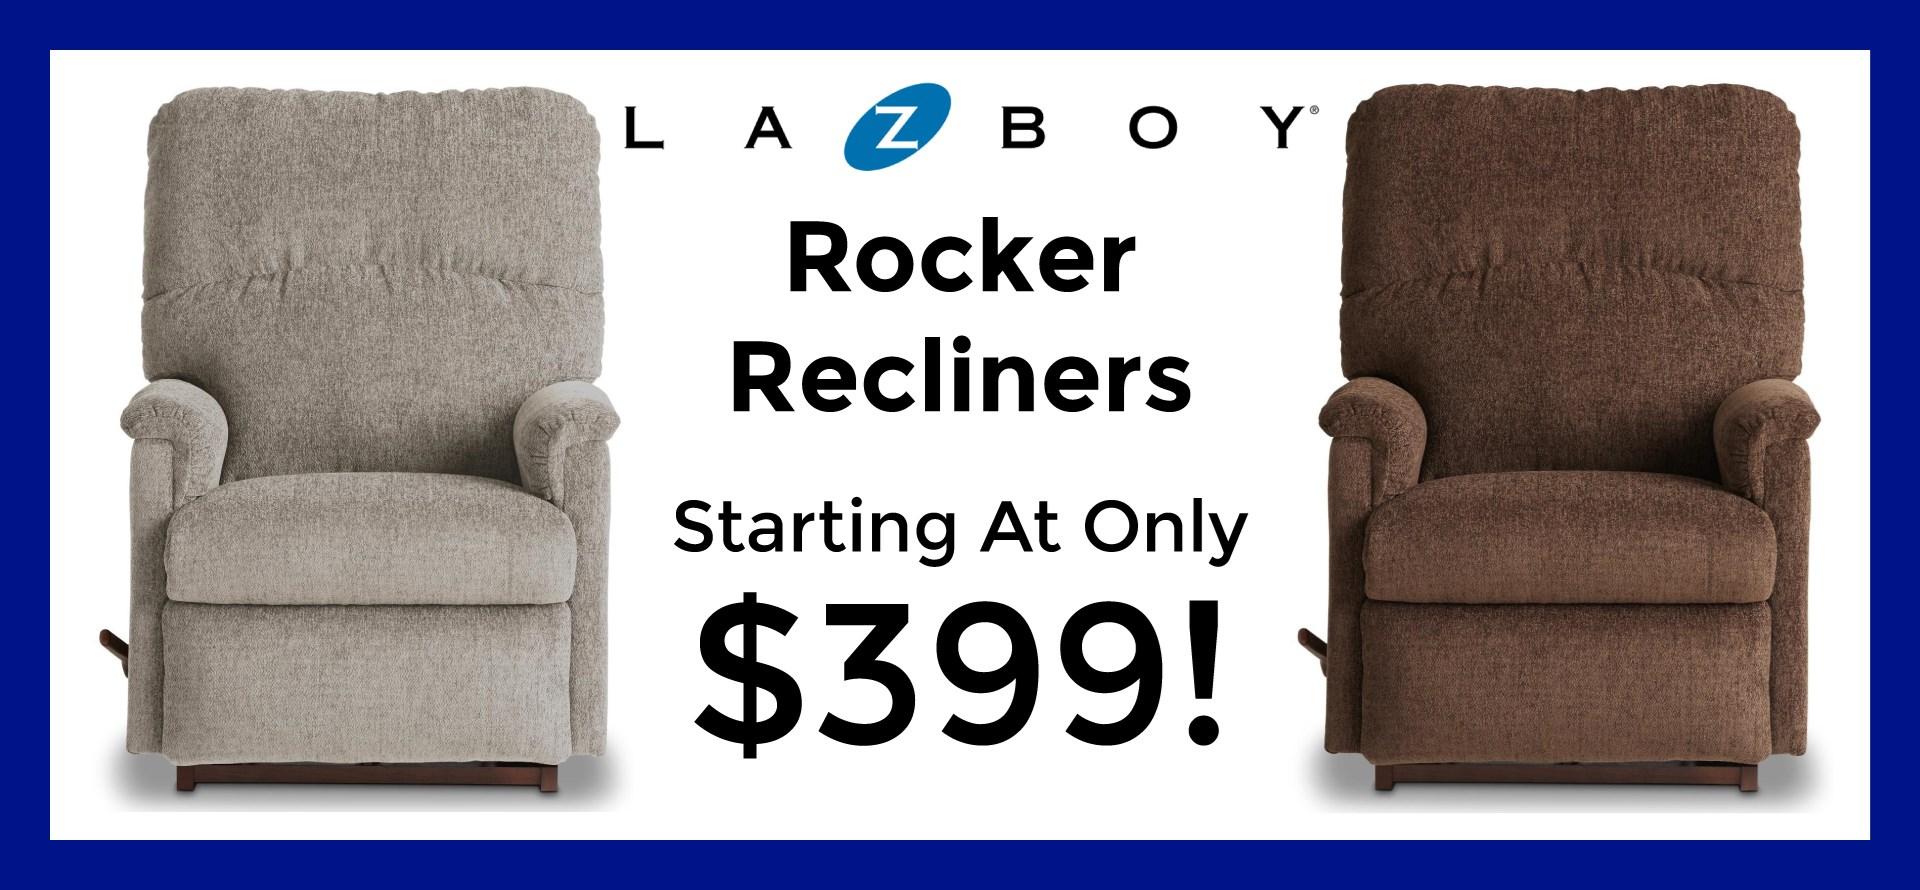 La-Z-Boy Rocker Recliners Starting At $399!